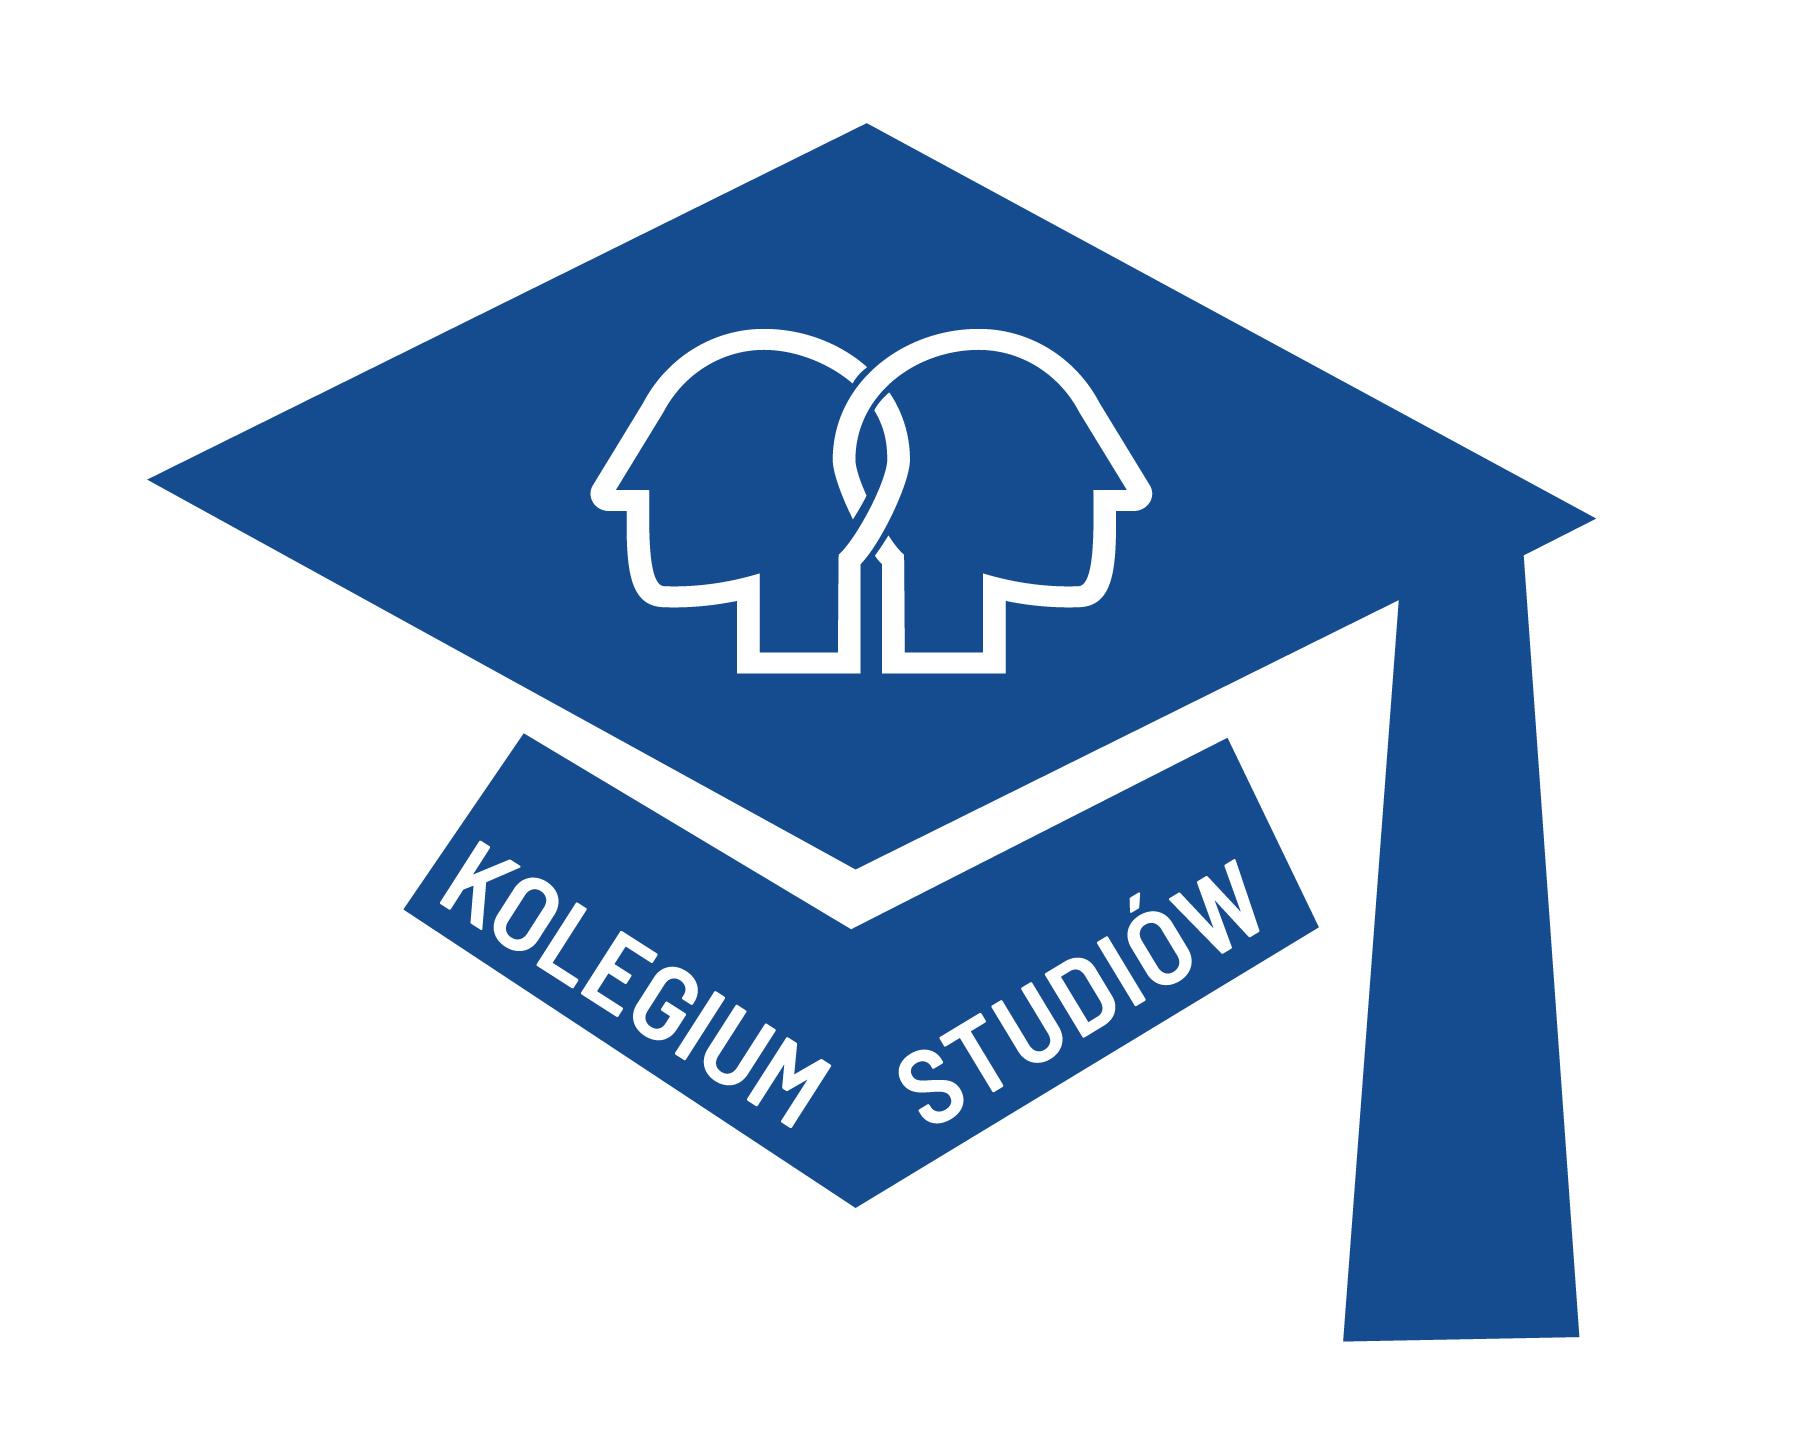 Kolegium Studiów